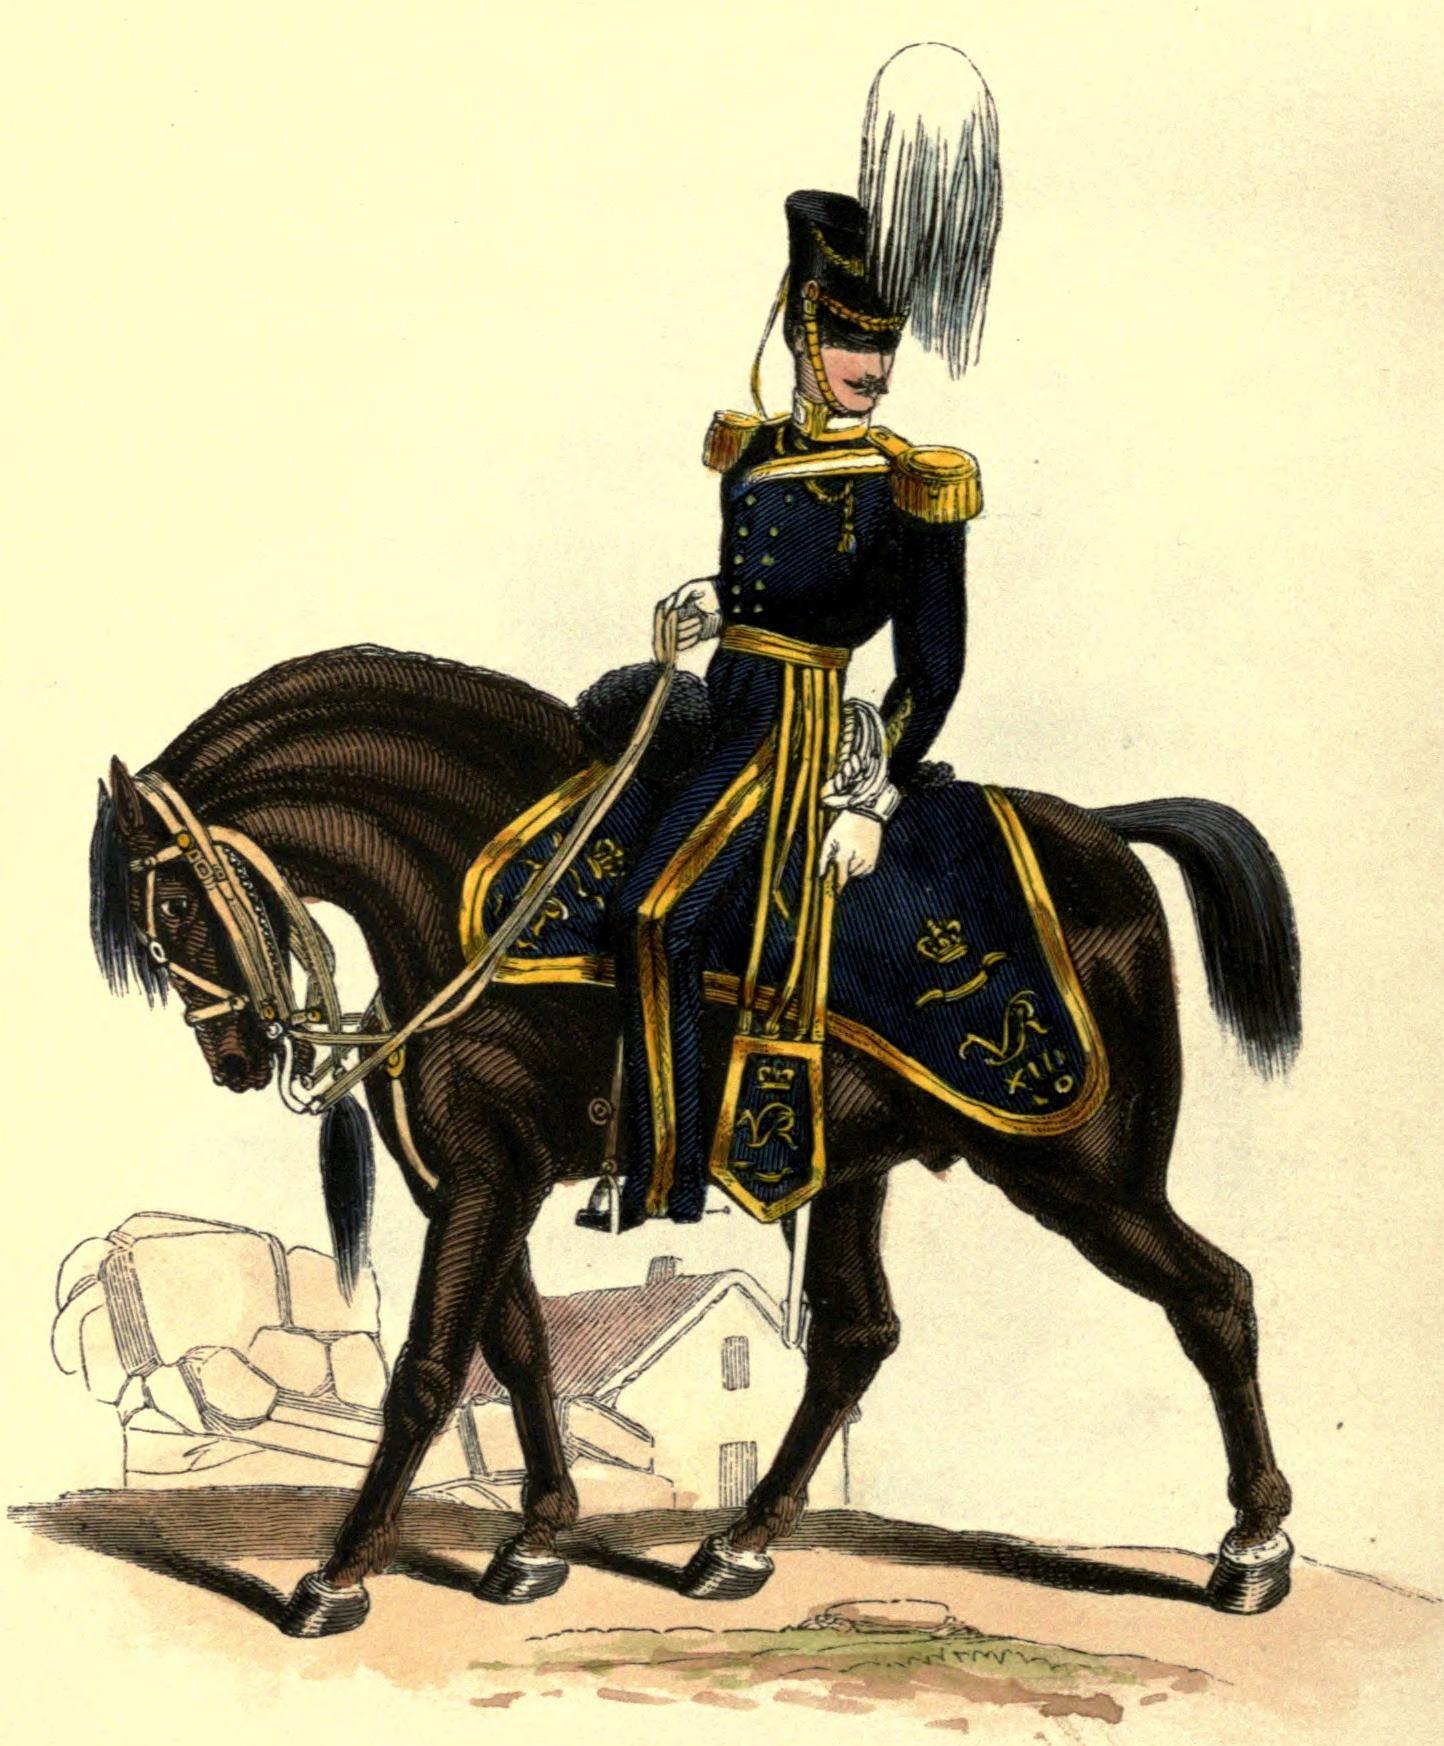 13th Regiment of Light Dragoons uniform